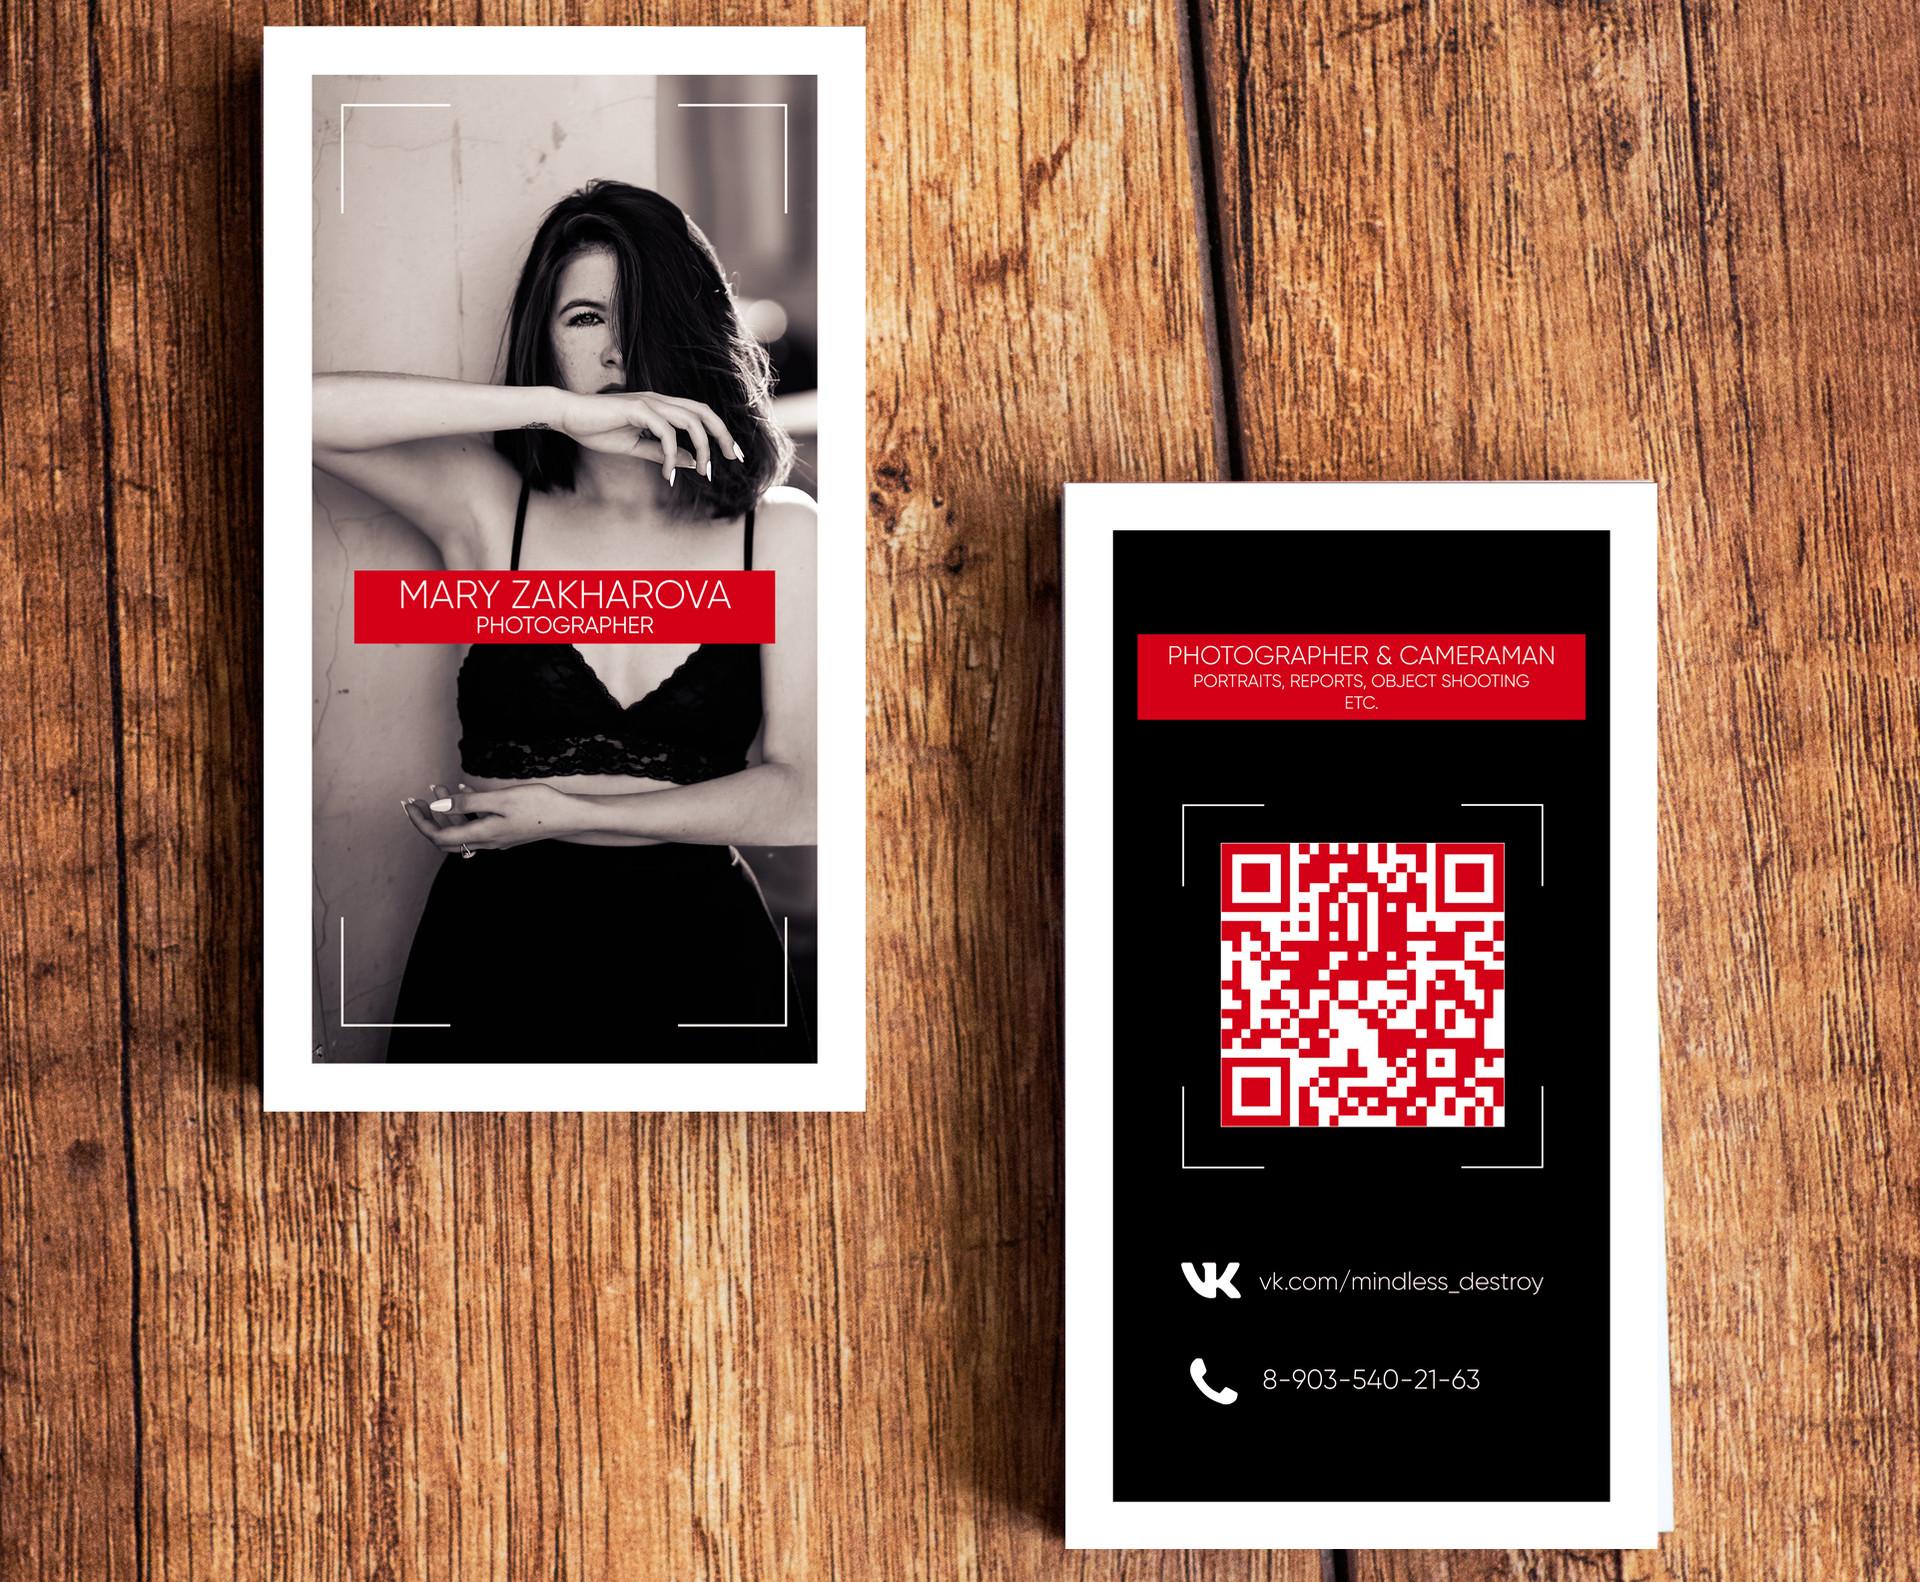 ArtStation - Photographer's Business Card, Negedozz Studios